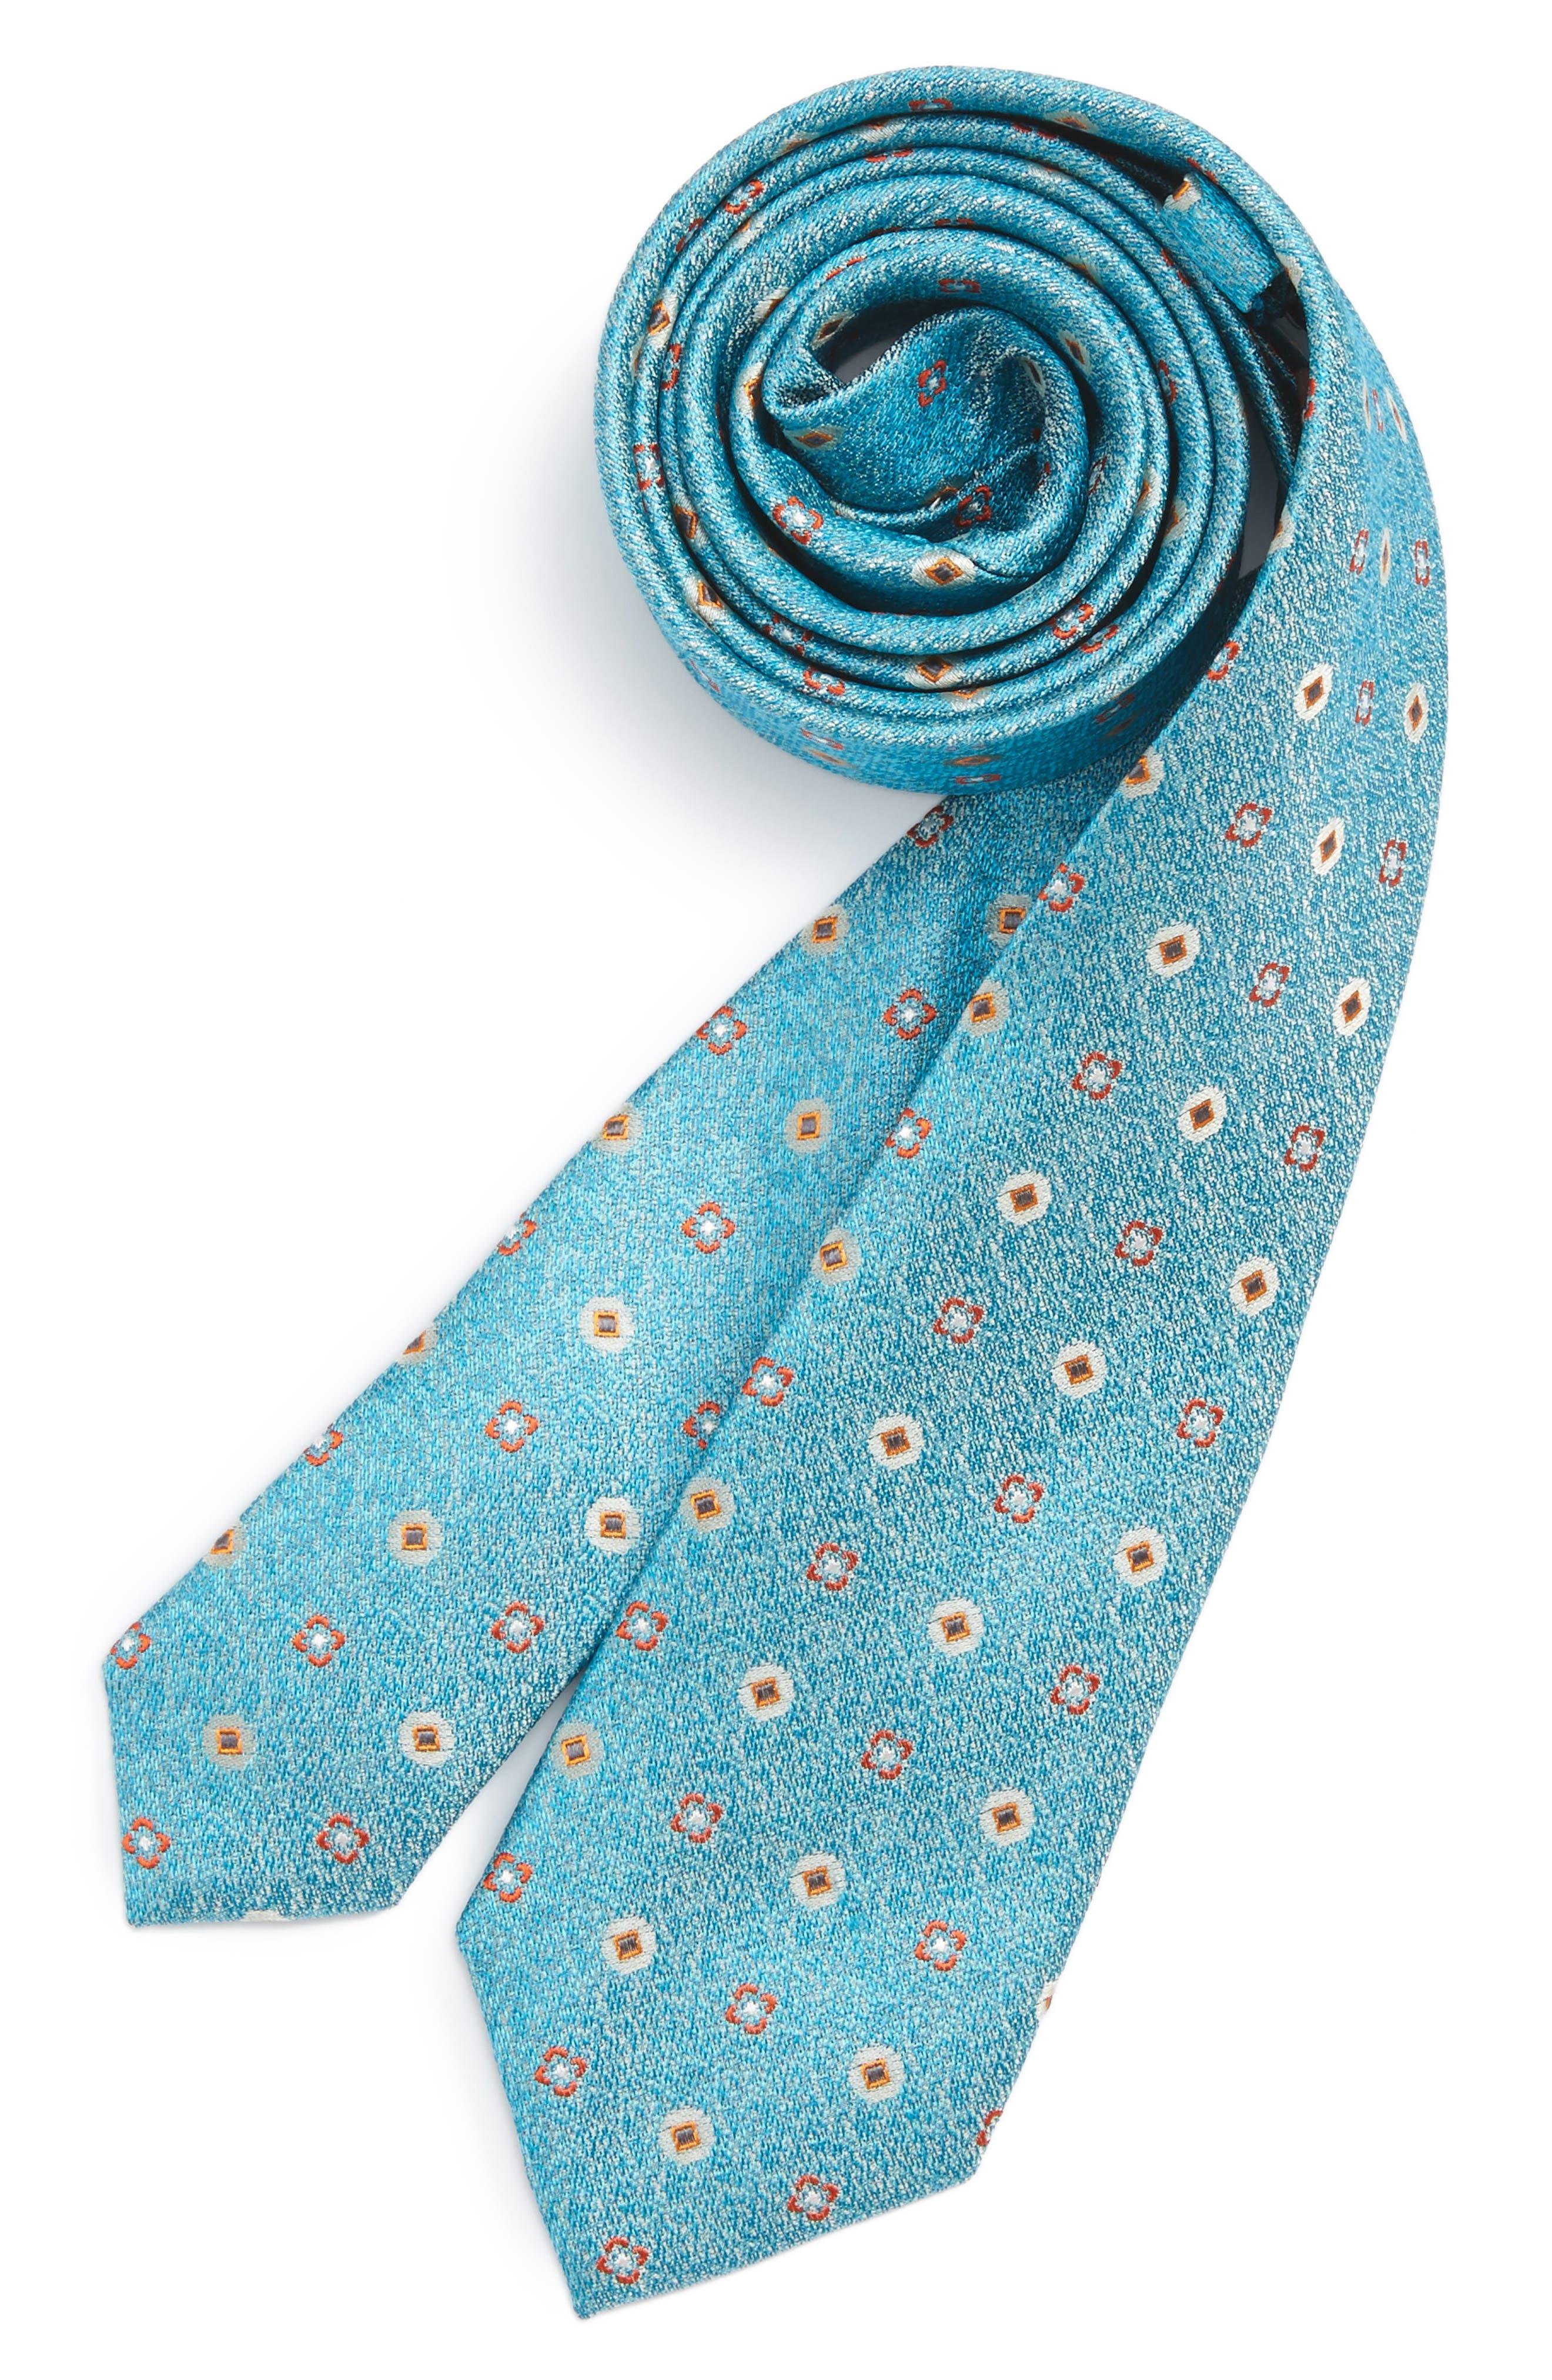 Boys Michael Kors Medallion Silk Tie Size One Size Big Boy  Bluegreen